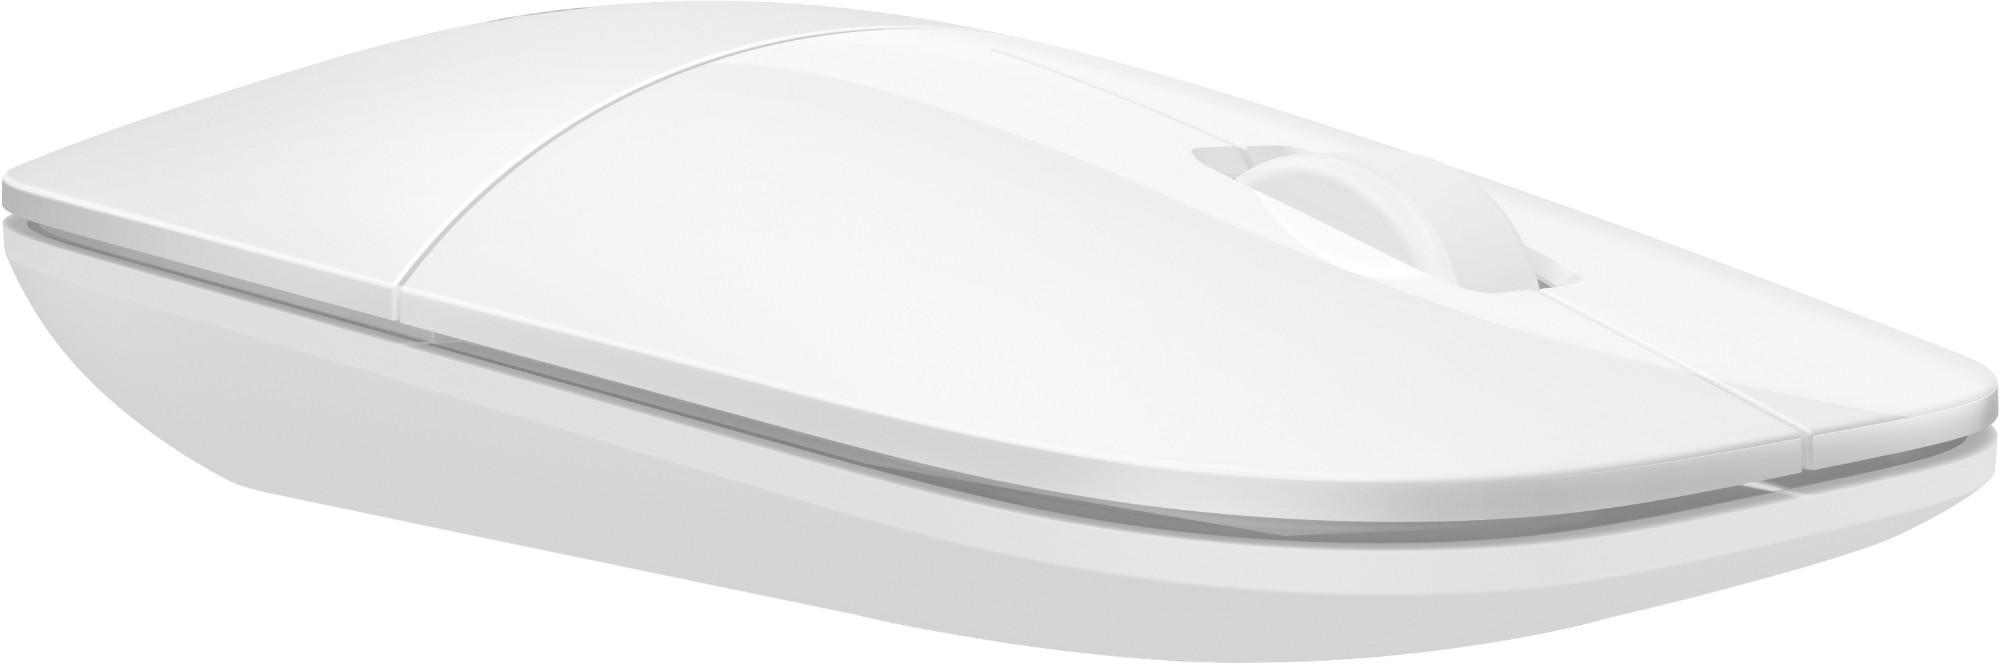 Wireless Mouse Z3700 White